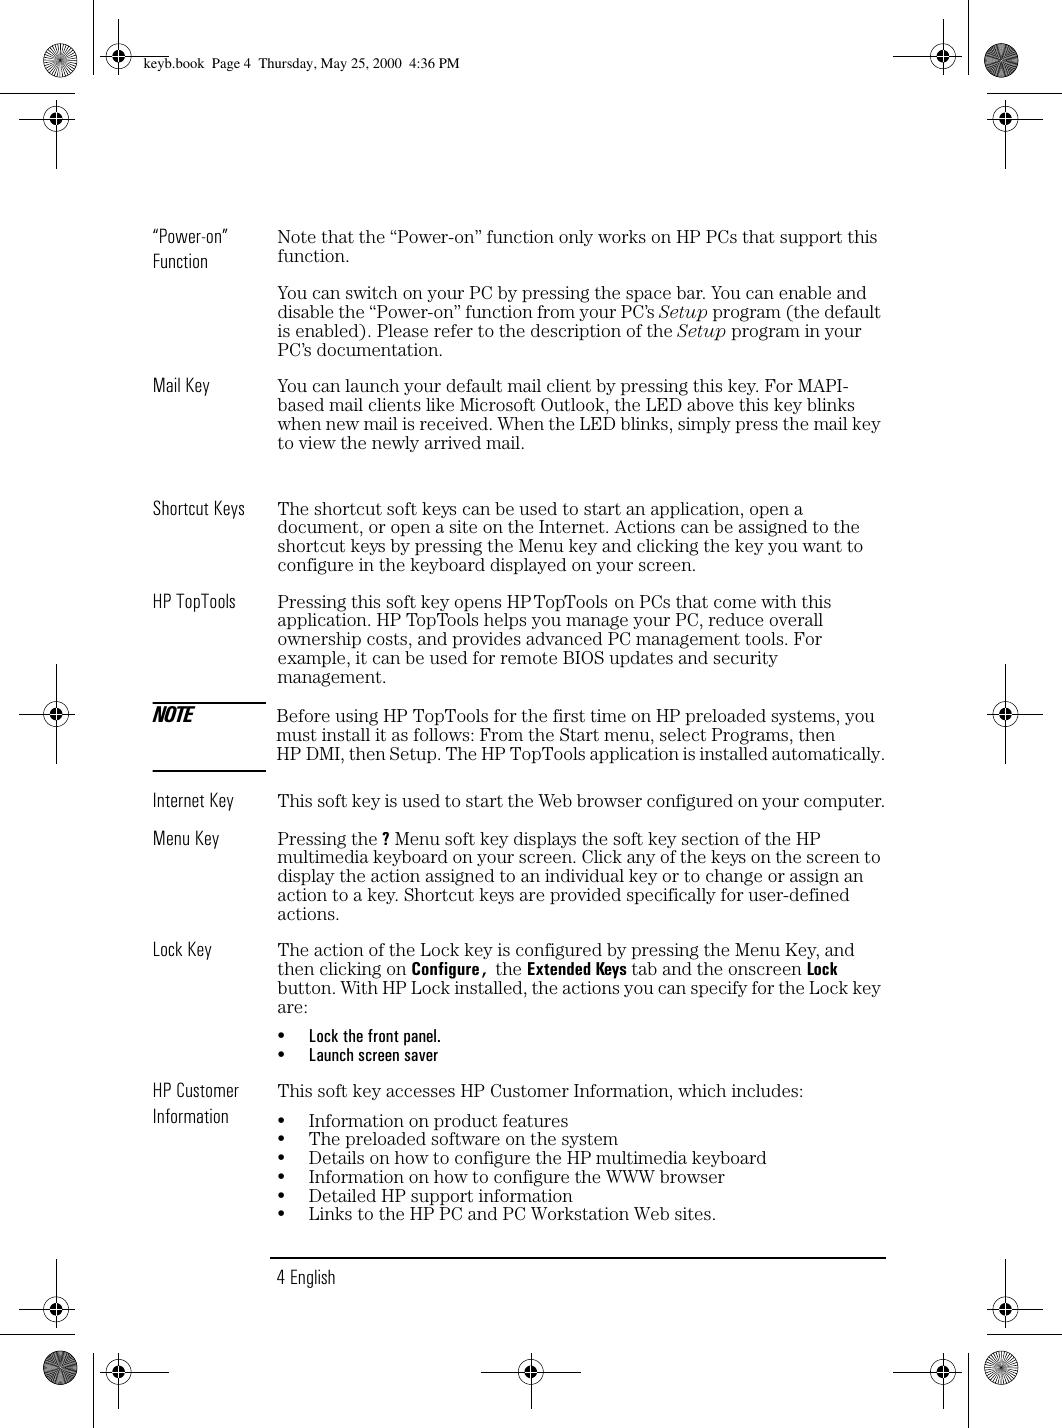 HP G Multimedia Keyboard (C4742B), User Guide Lpv09504